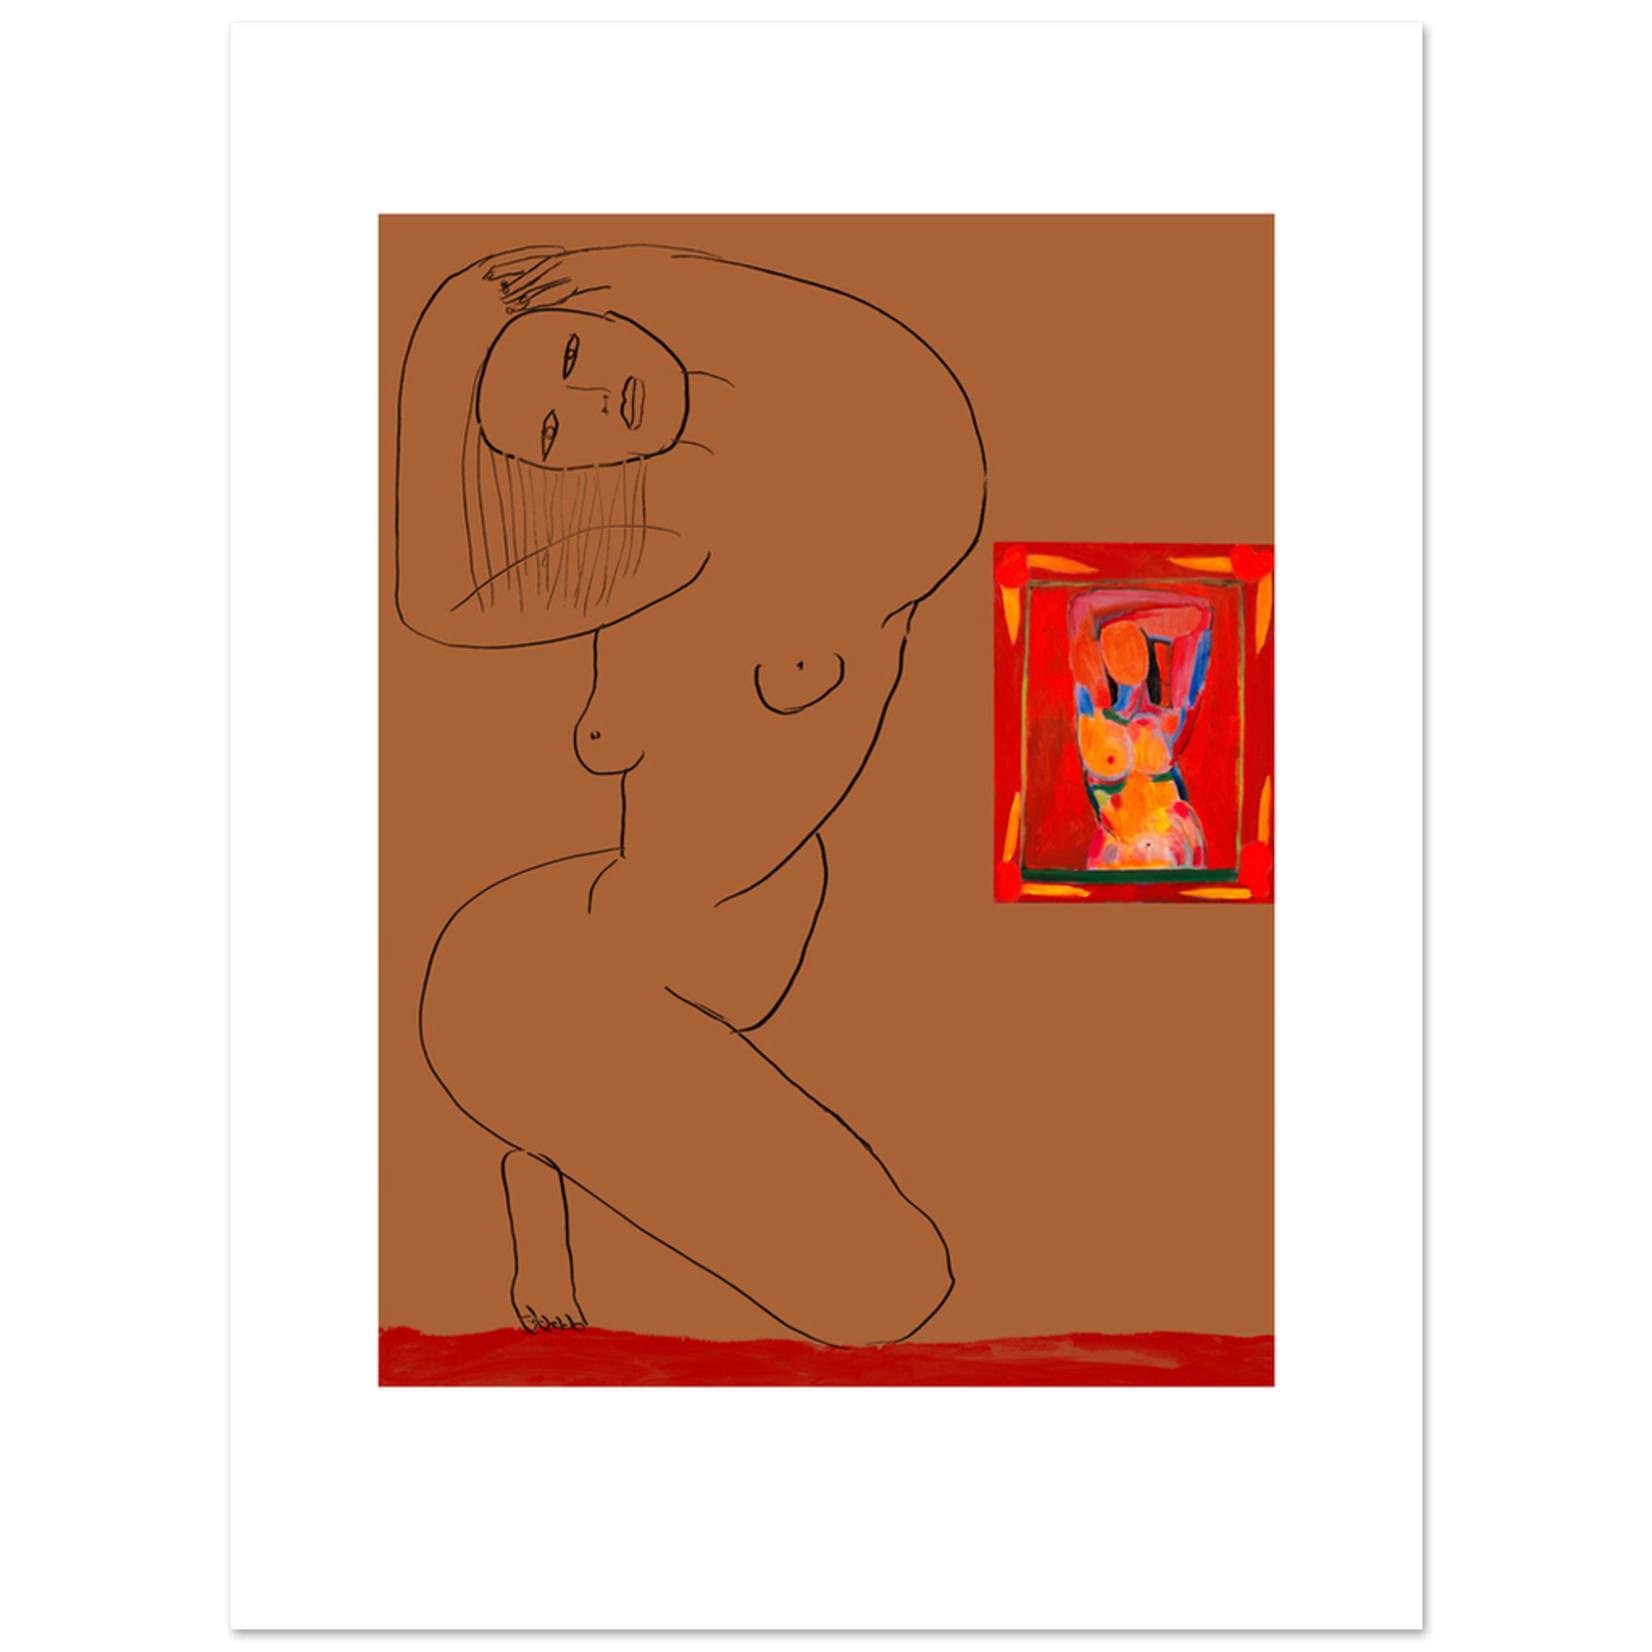 Limited Edition Prints Cinnamon nude, 2007